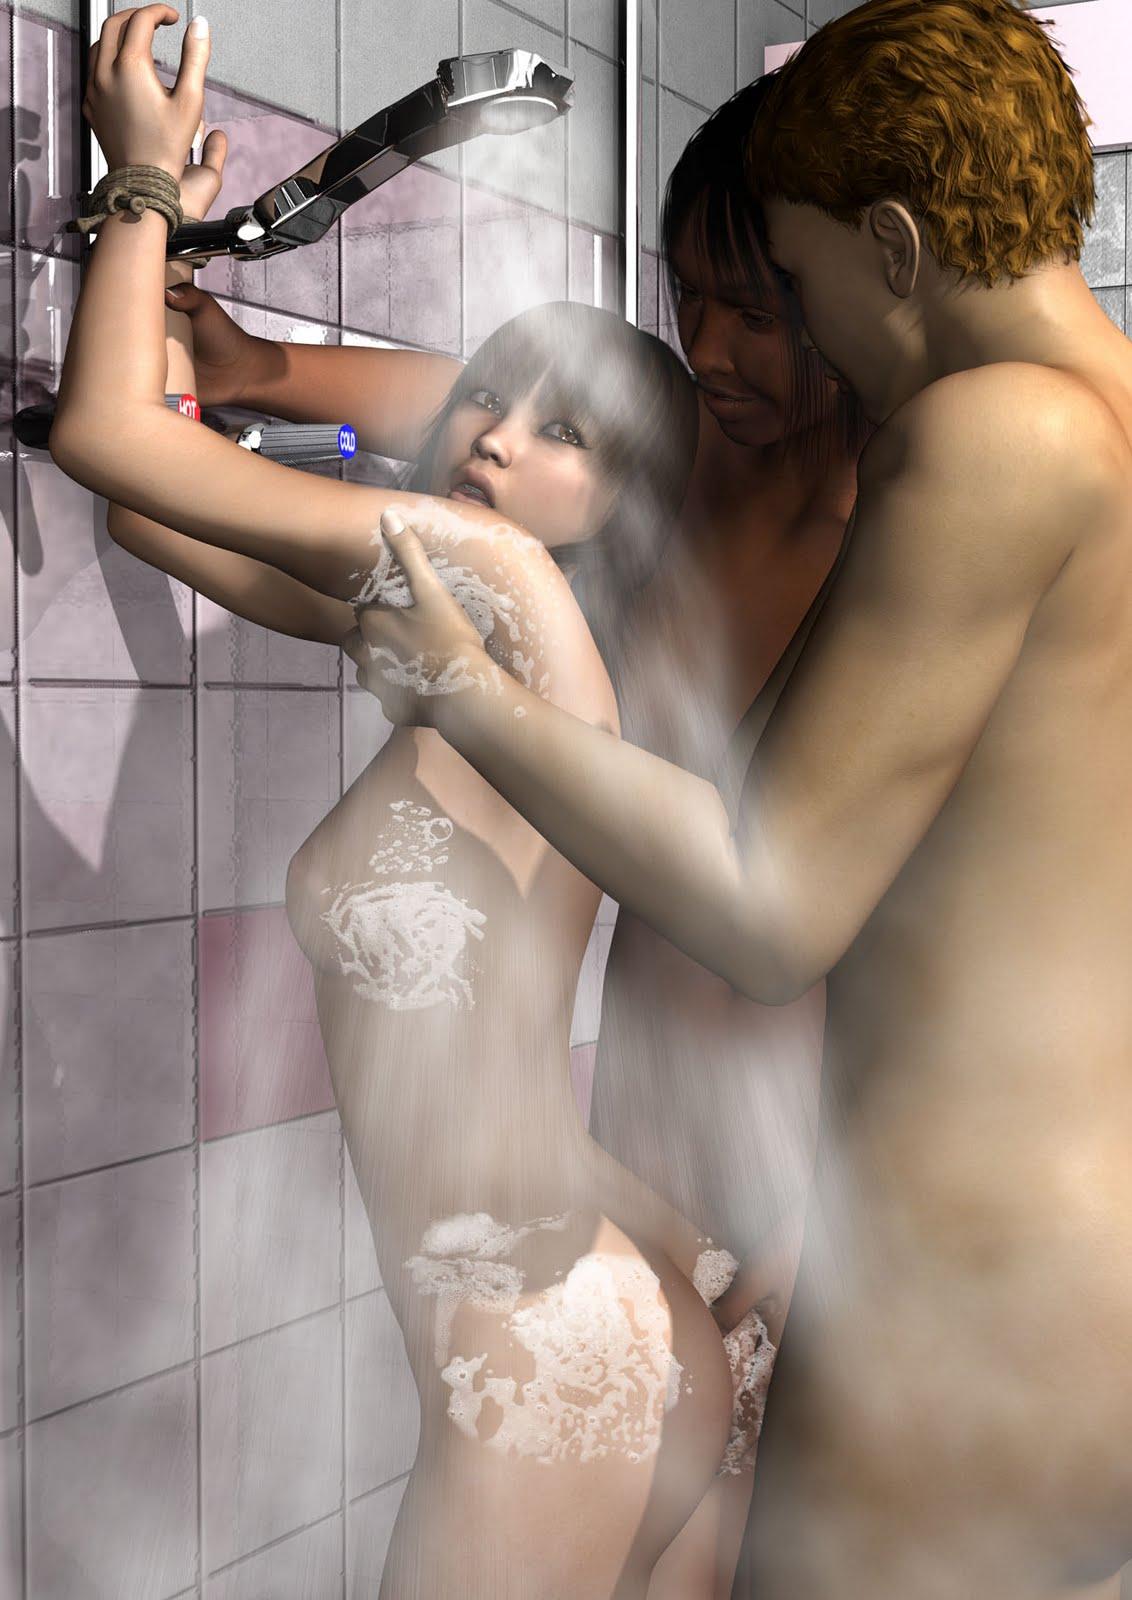 3d toon porn bdsm nude photos